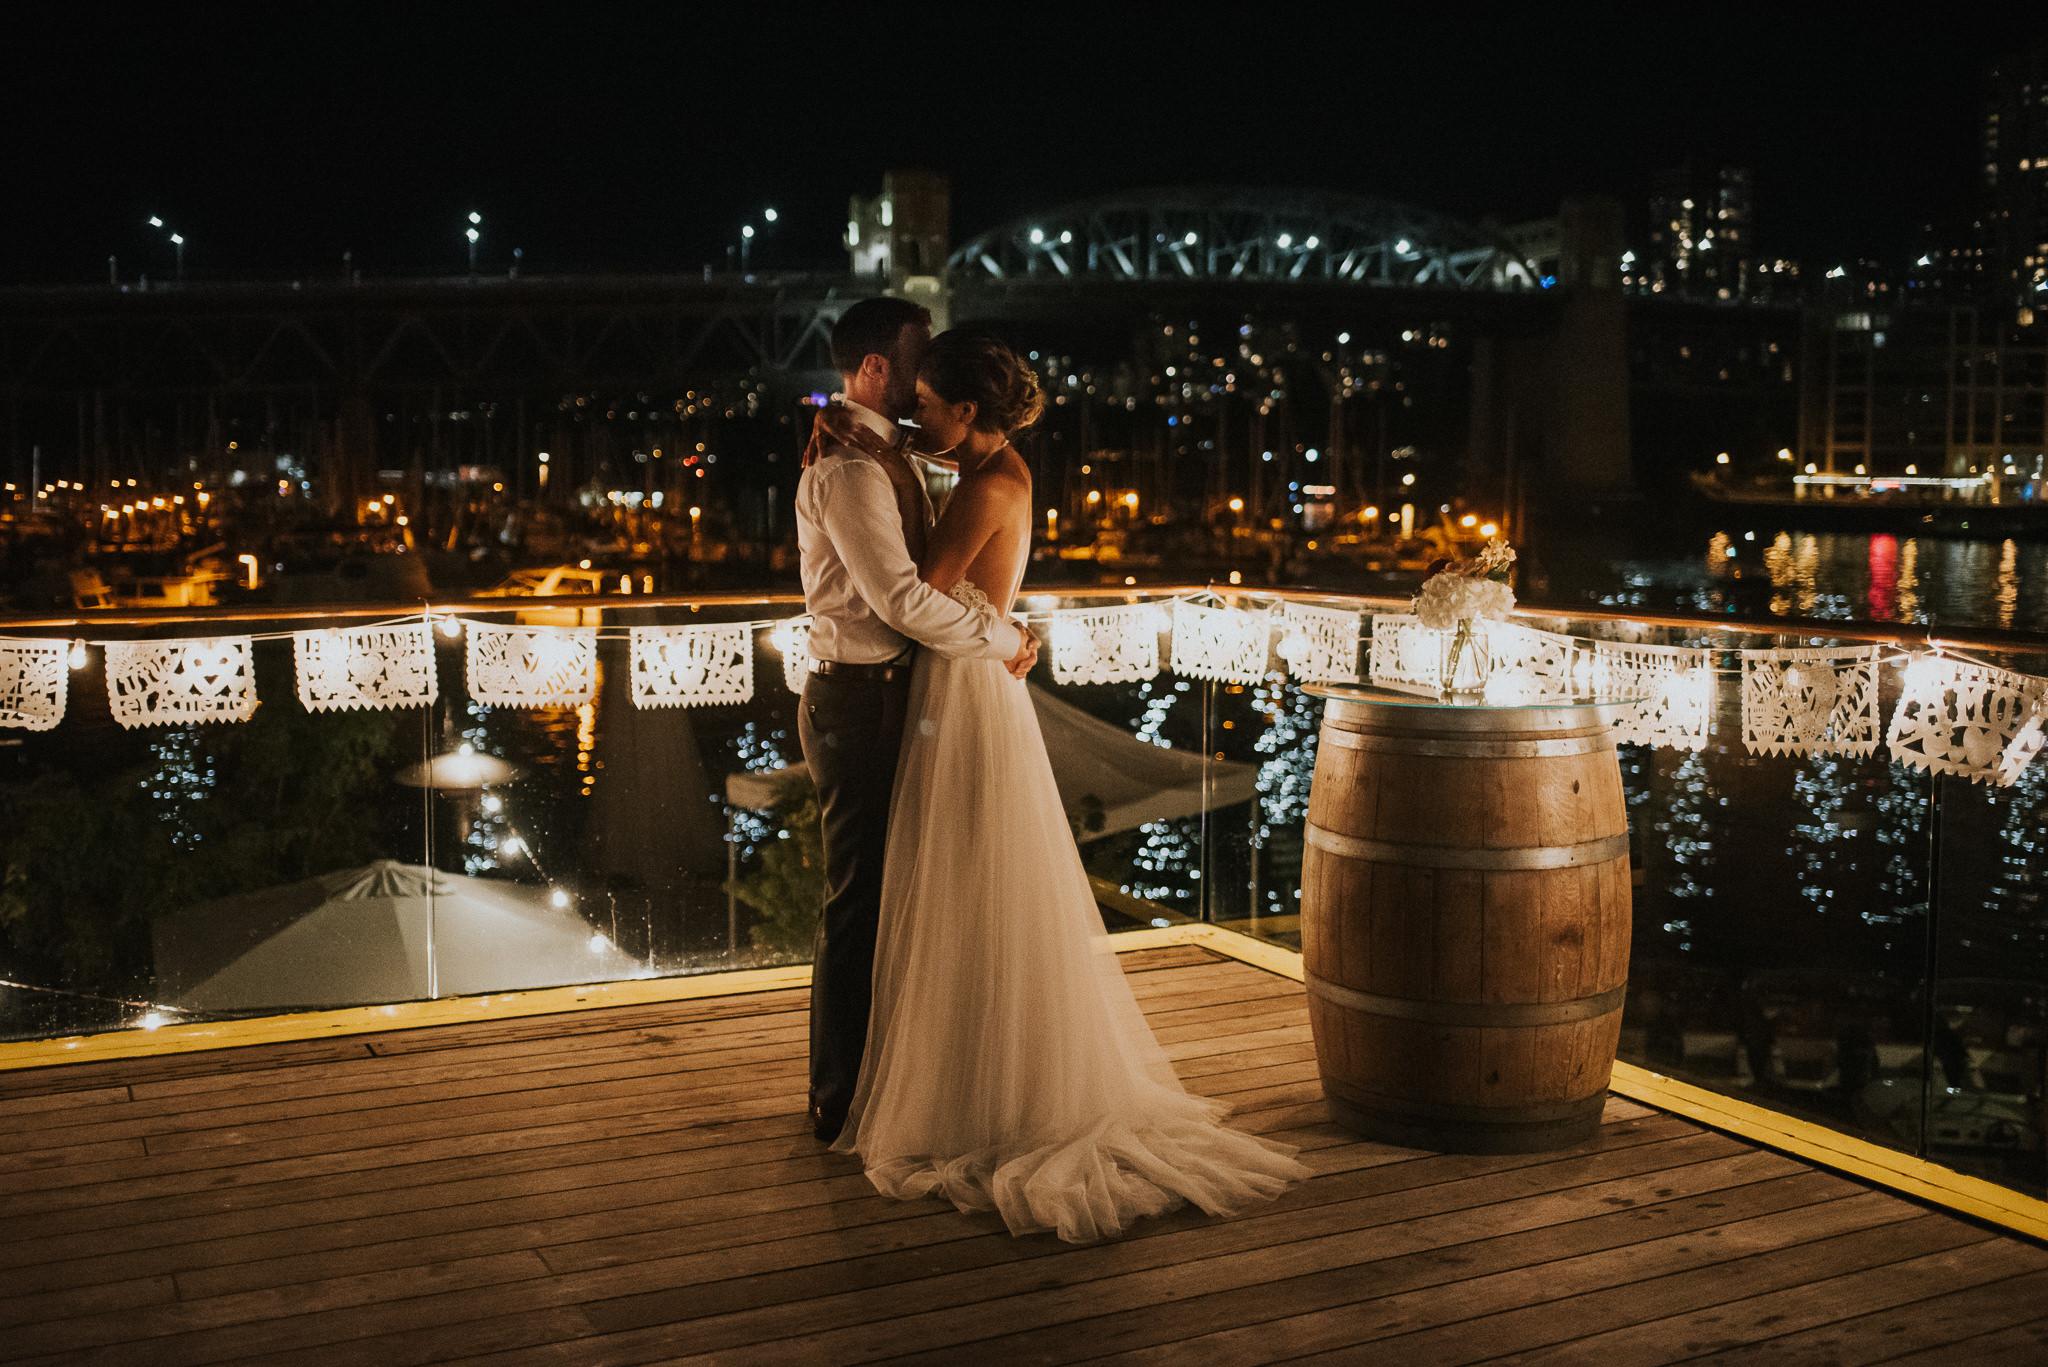 225-bridges-granville-island-vancouver-wedding-ayakopaddy-web-5466.jpg